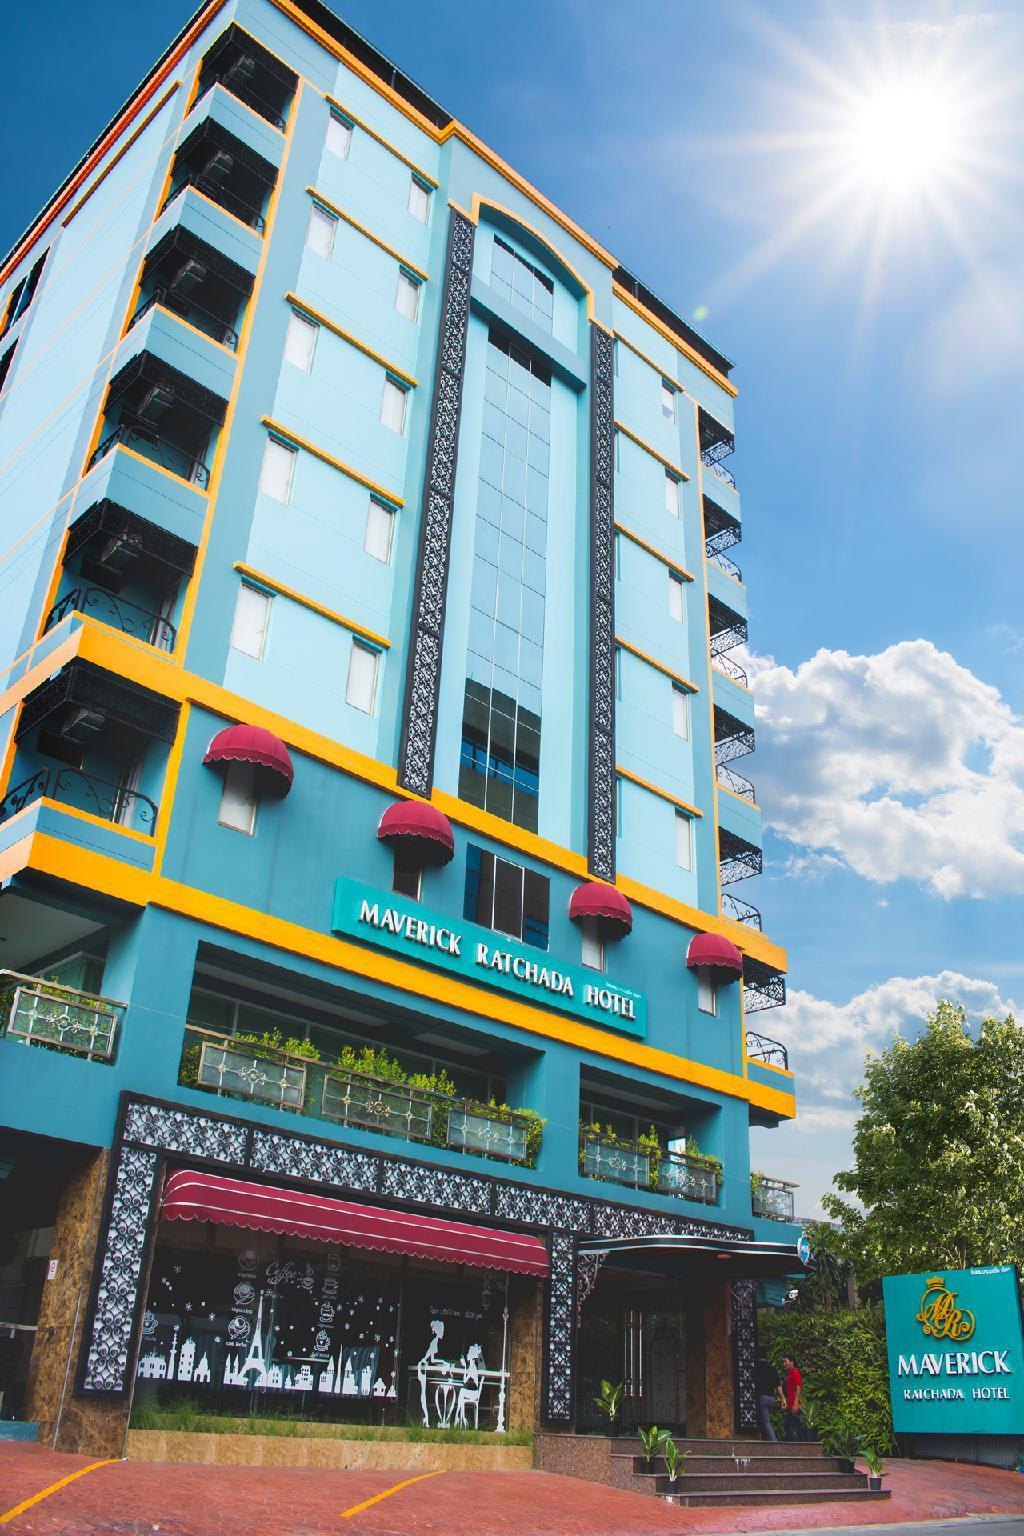 Maverick Ratchada Hotel โรงแรมมาเวอร์ริค รัชดา